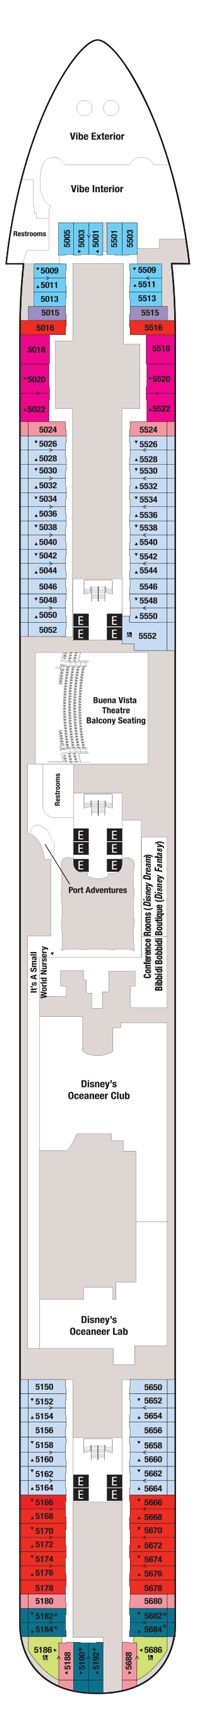 Disney Fantasy Deck 5 -- Cabins & Reviews -- Cruise Critic